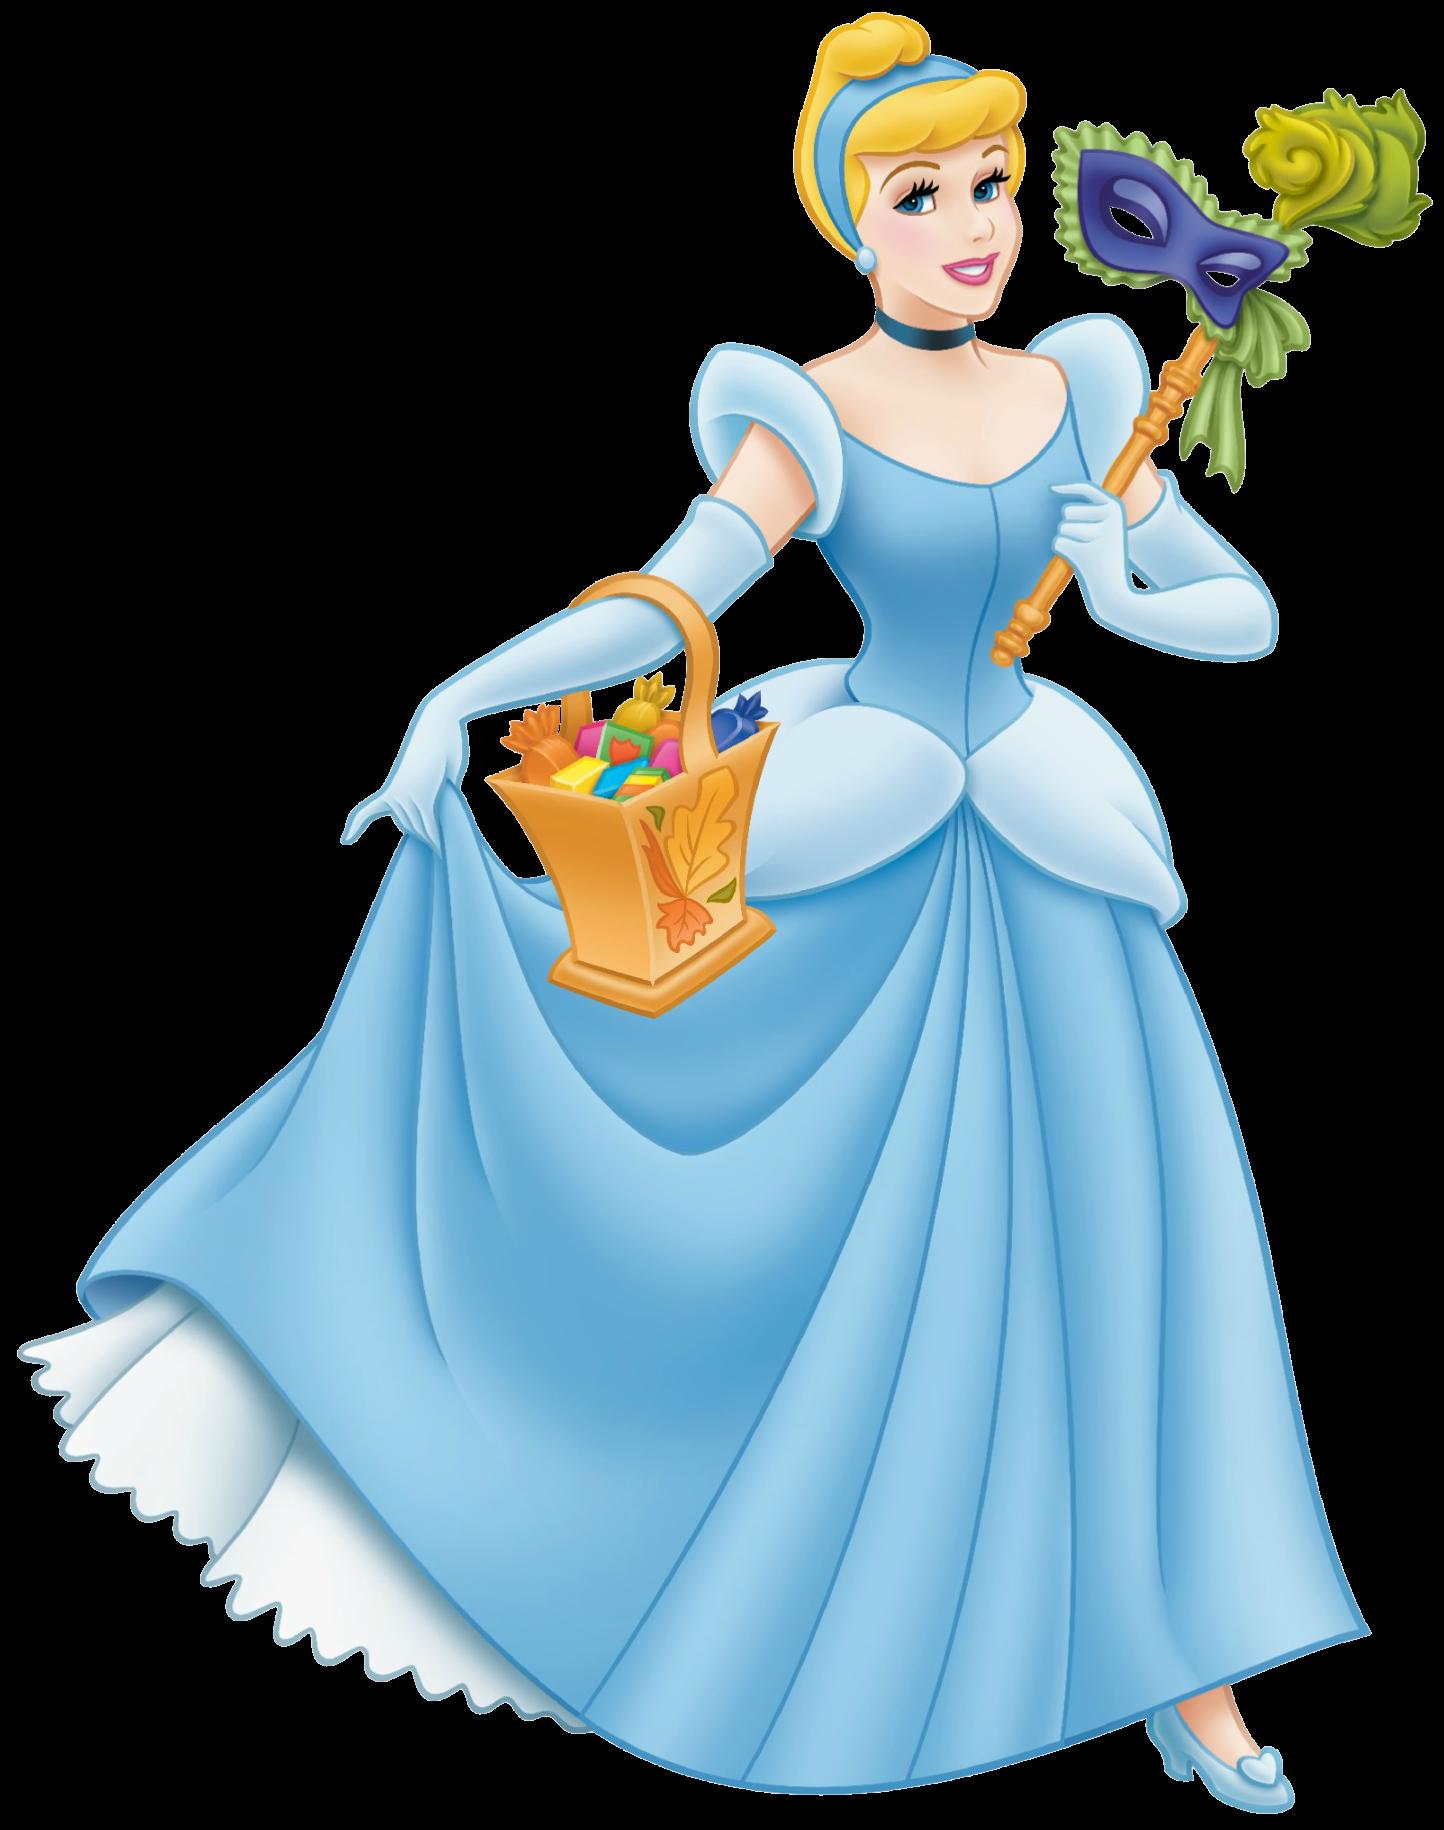 clipart library Cinderella clipart simple princess. R sultats de recherche.